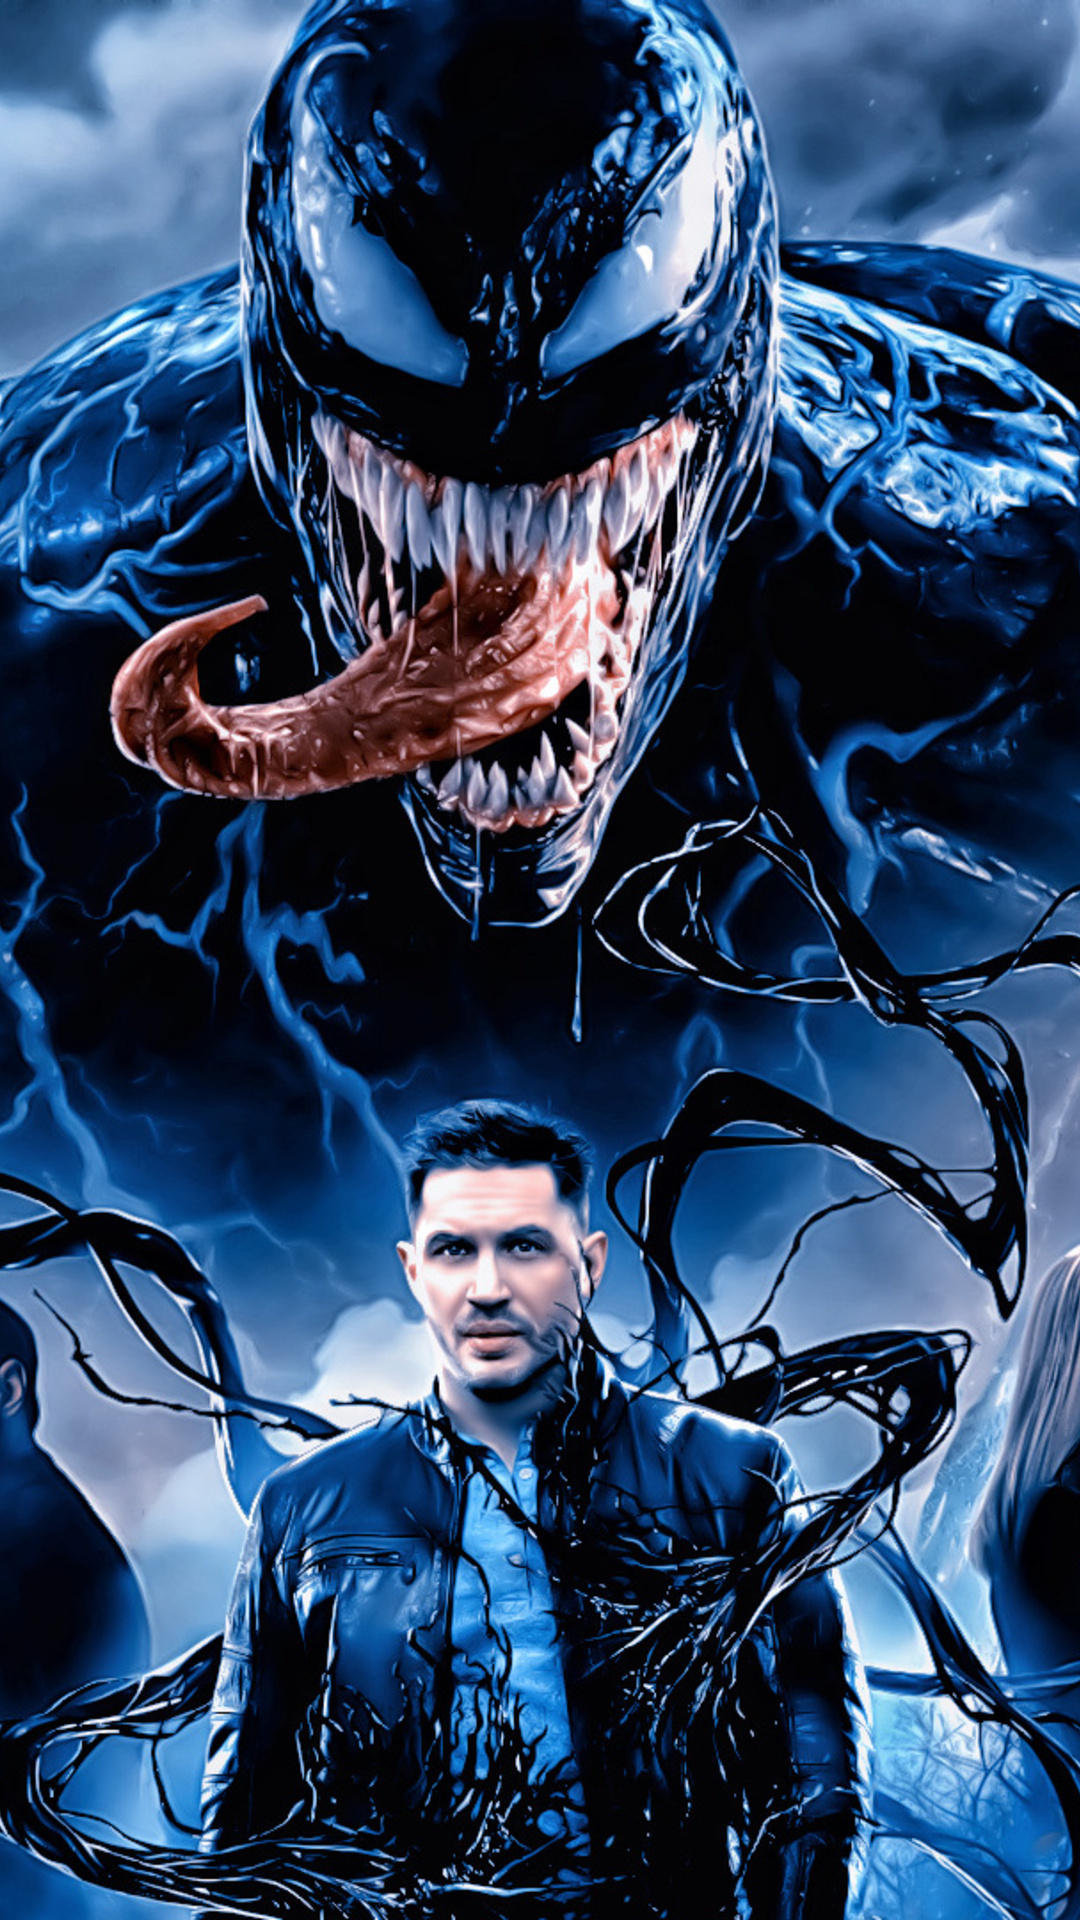 1080x1920 Venom Movie 2018 HD Iphone 7,6s,6 Plus, Pixel xl ...